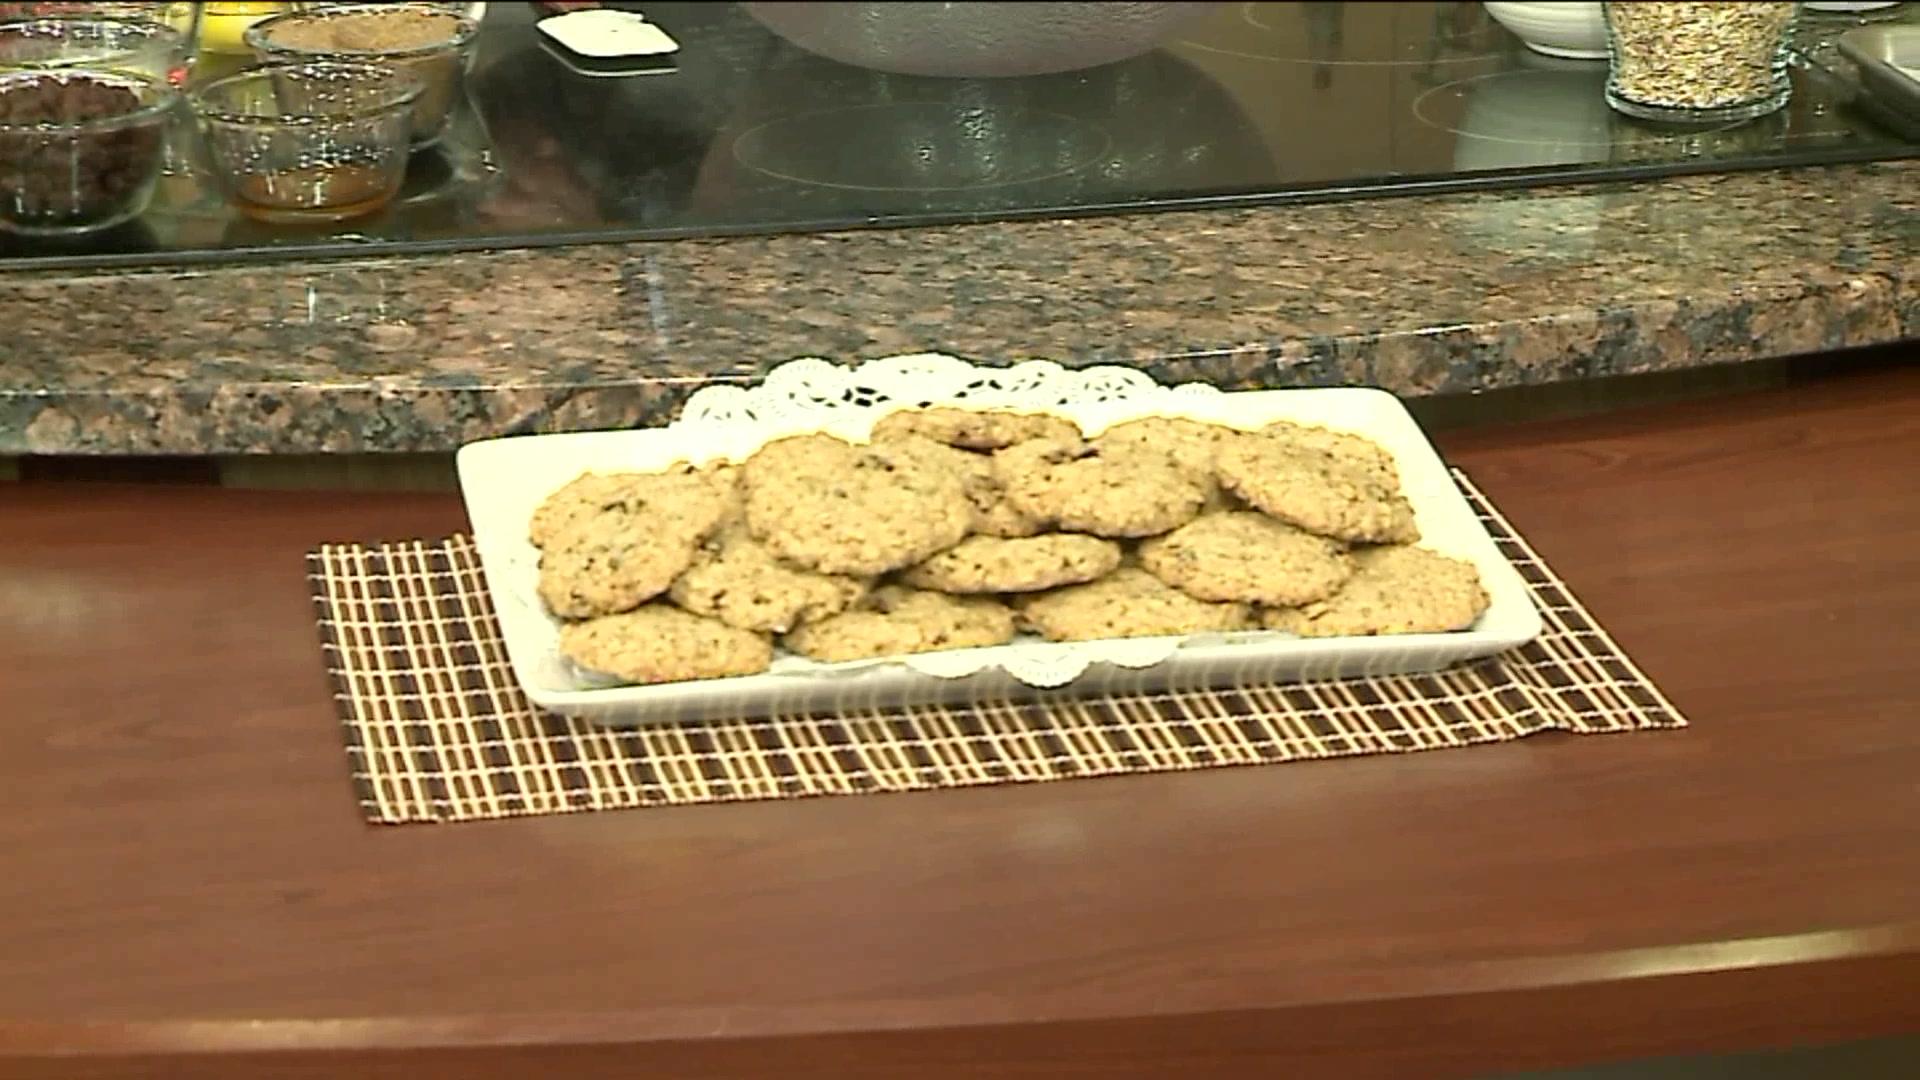 How to Make Gluten-Free Oatmeal Cookies